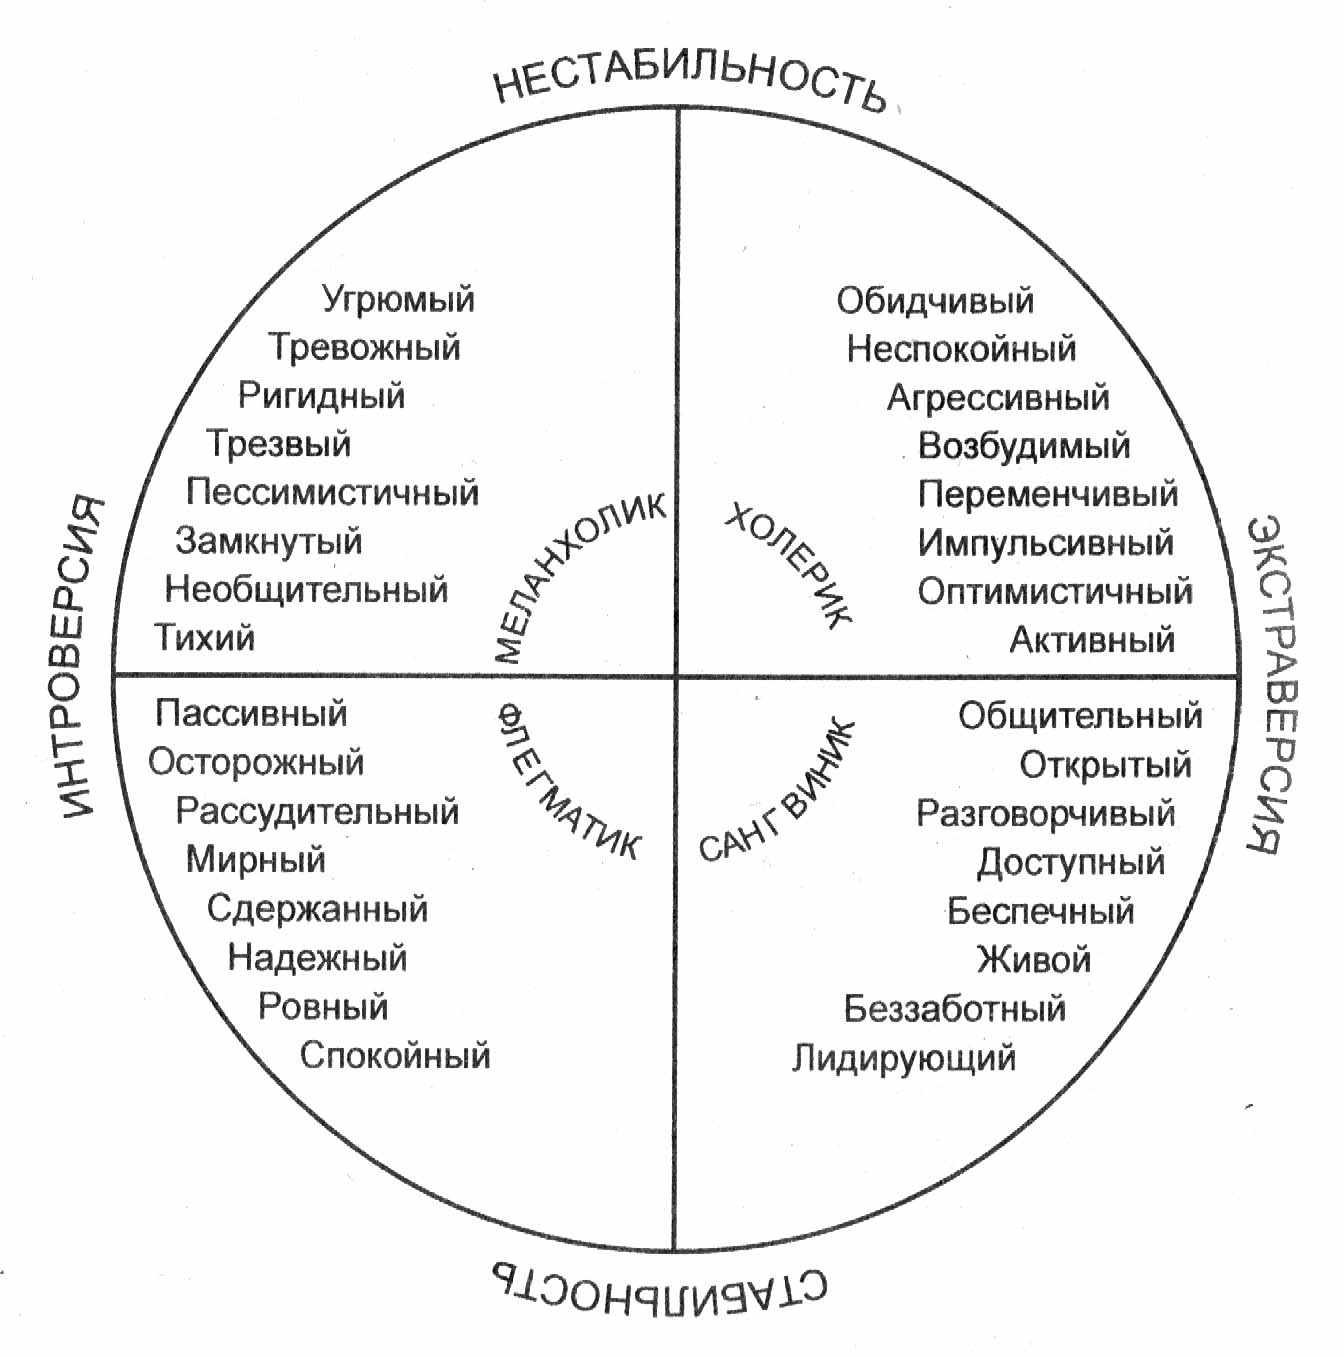 Круг Айзенка - концепция для темпераментов